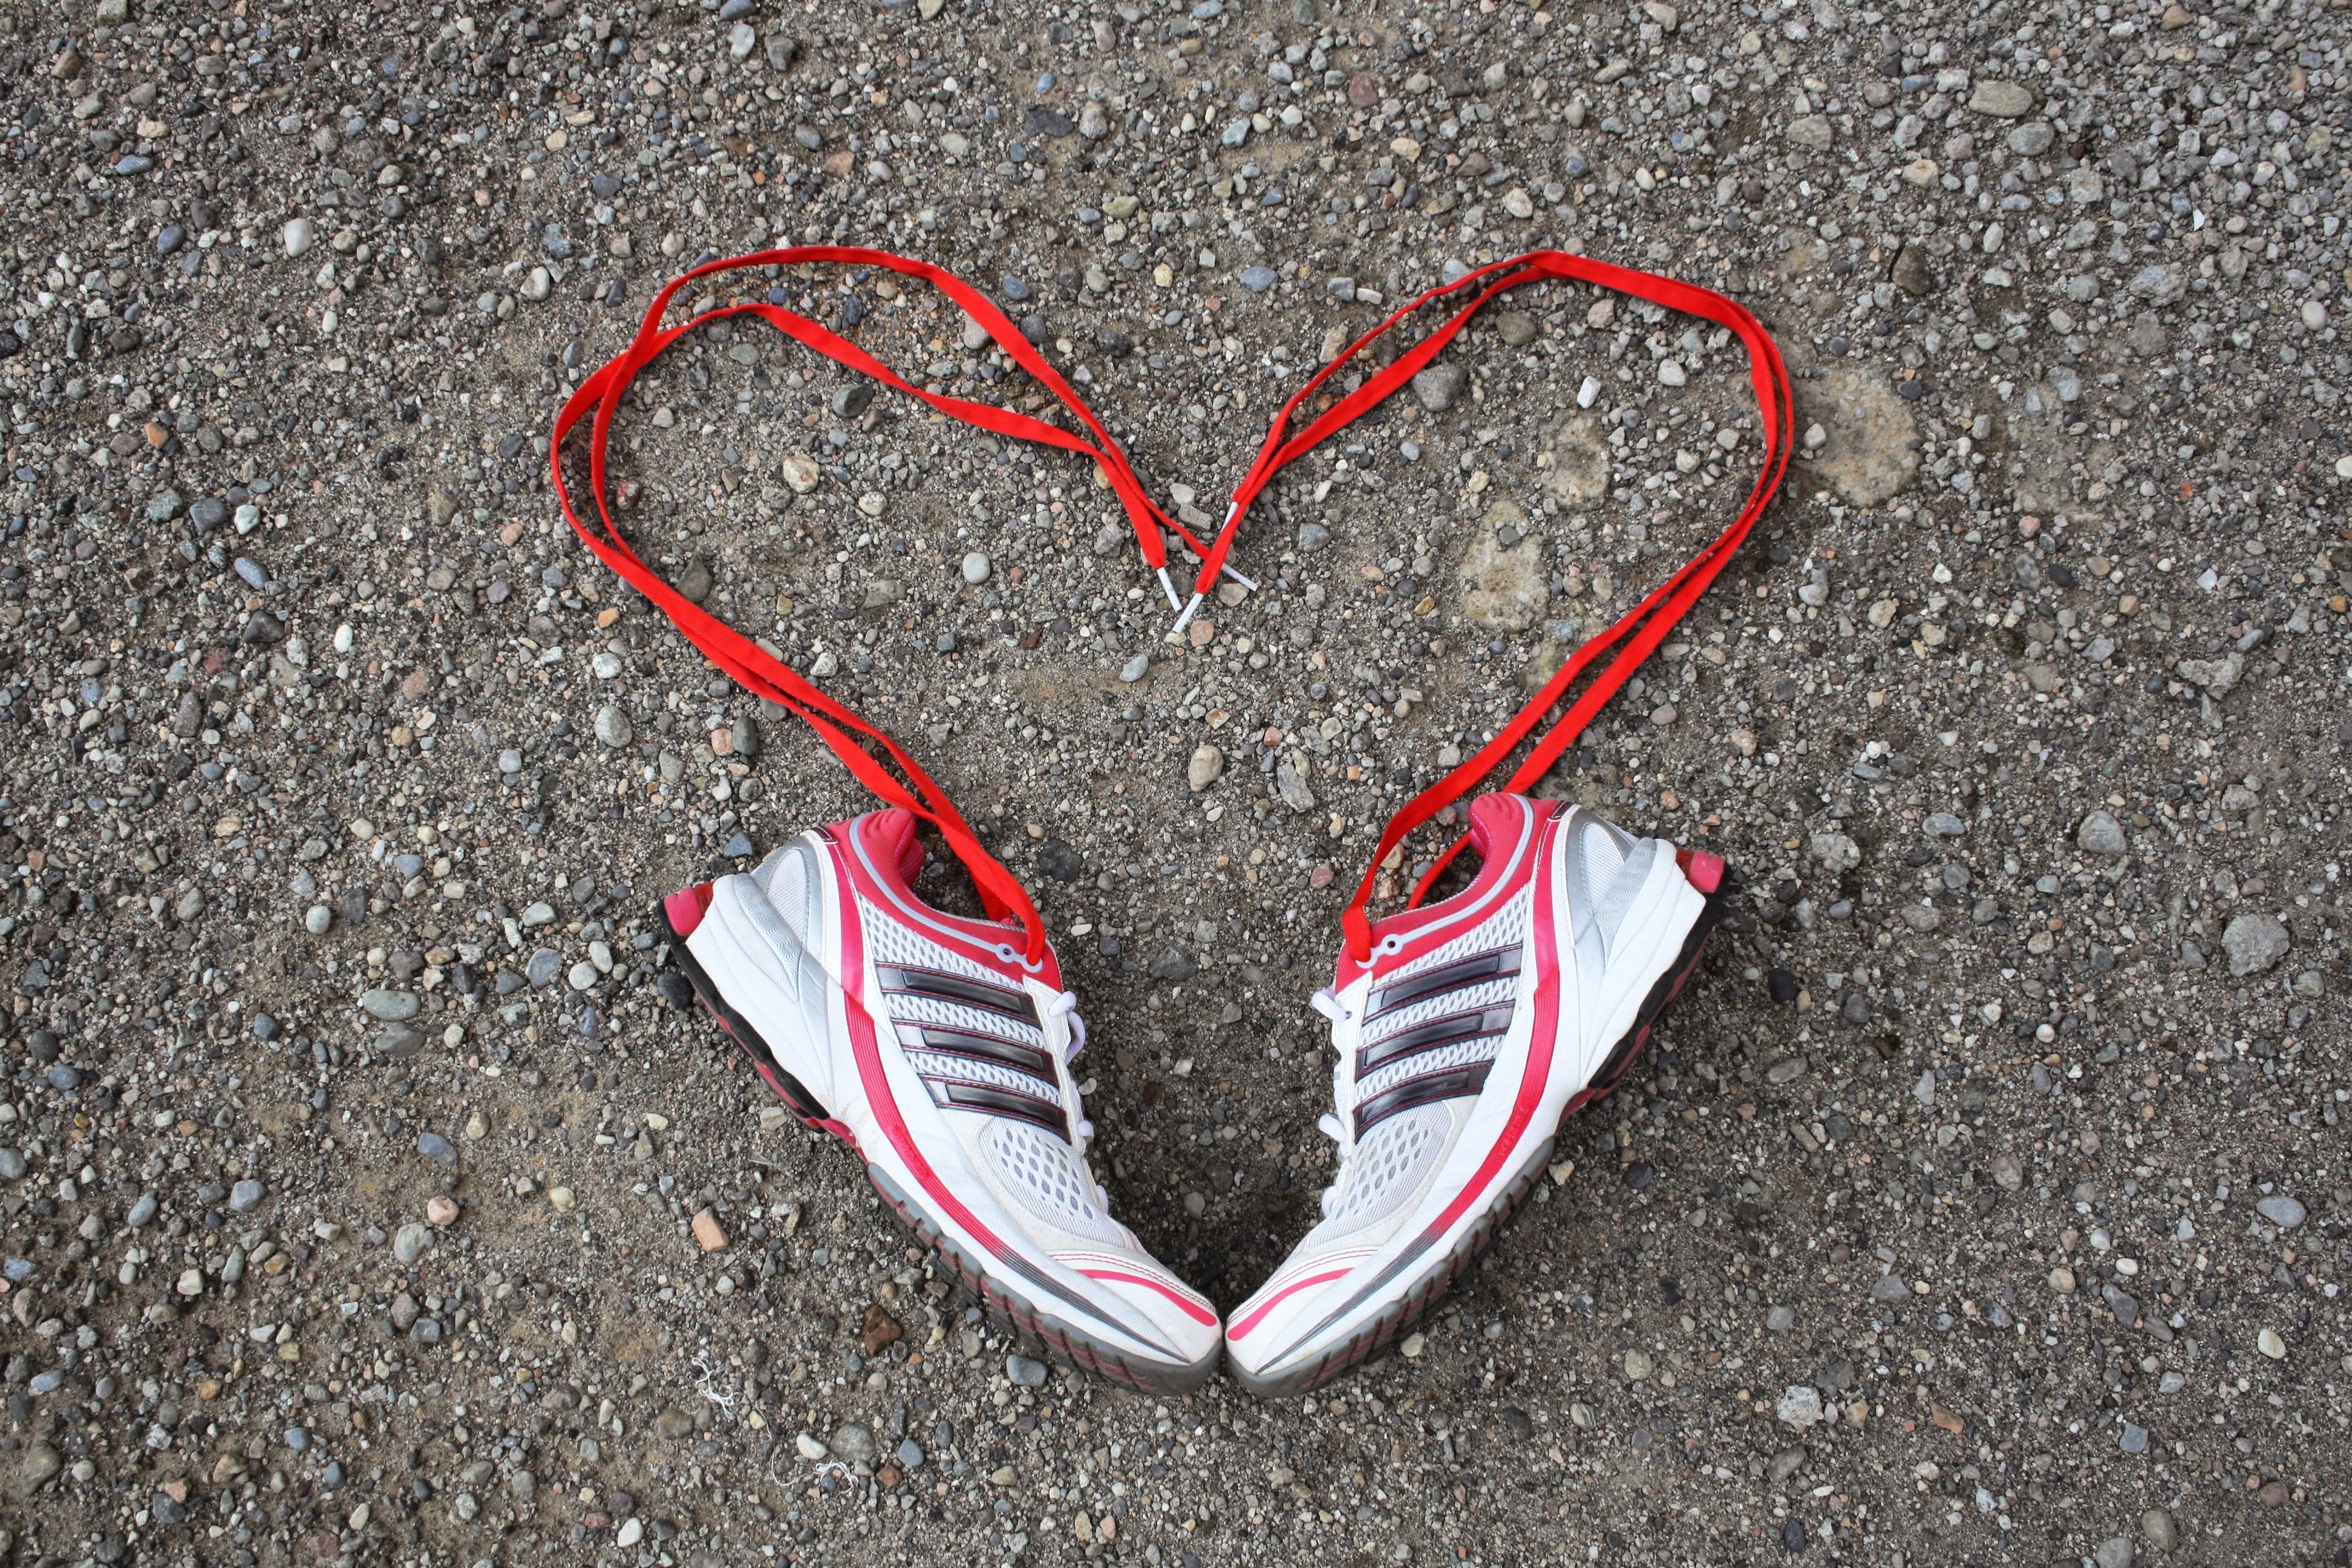 бегущее сердце картинка далее перед